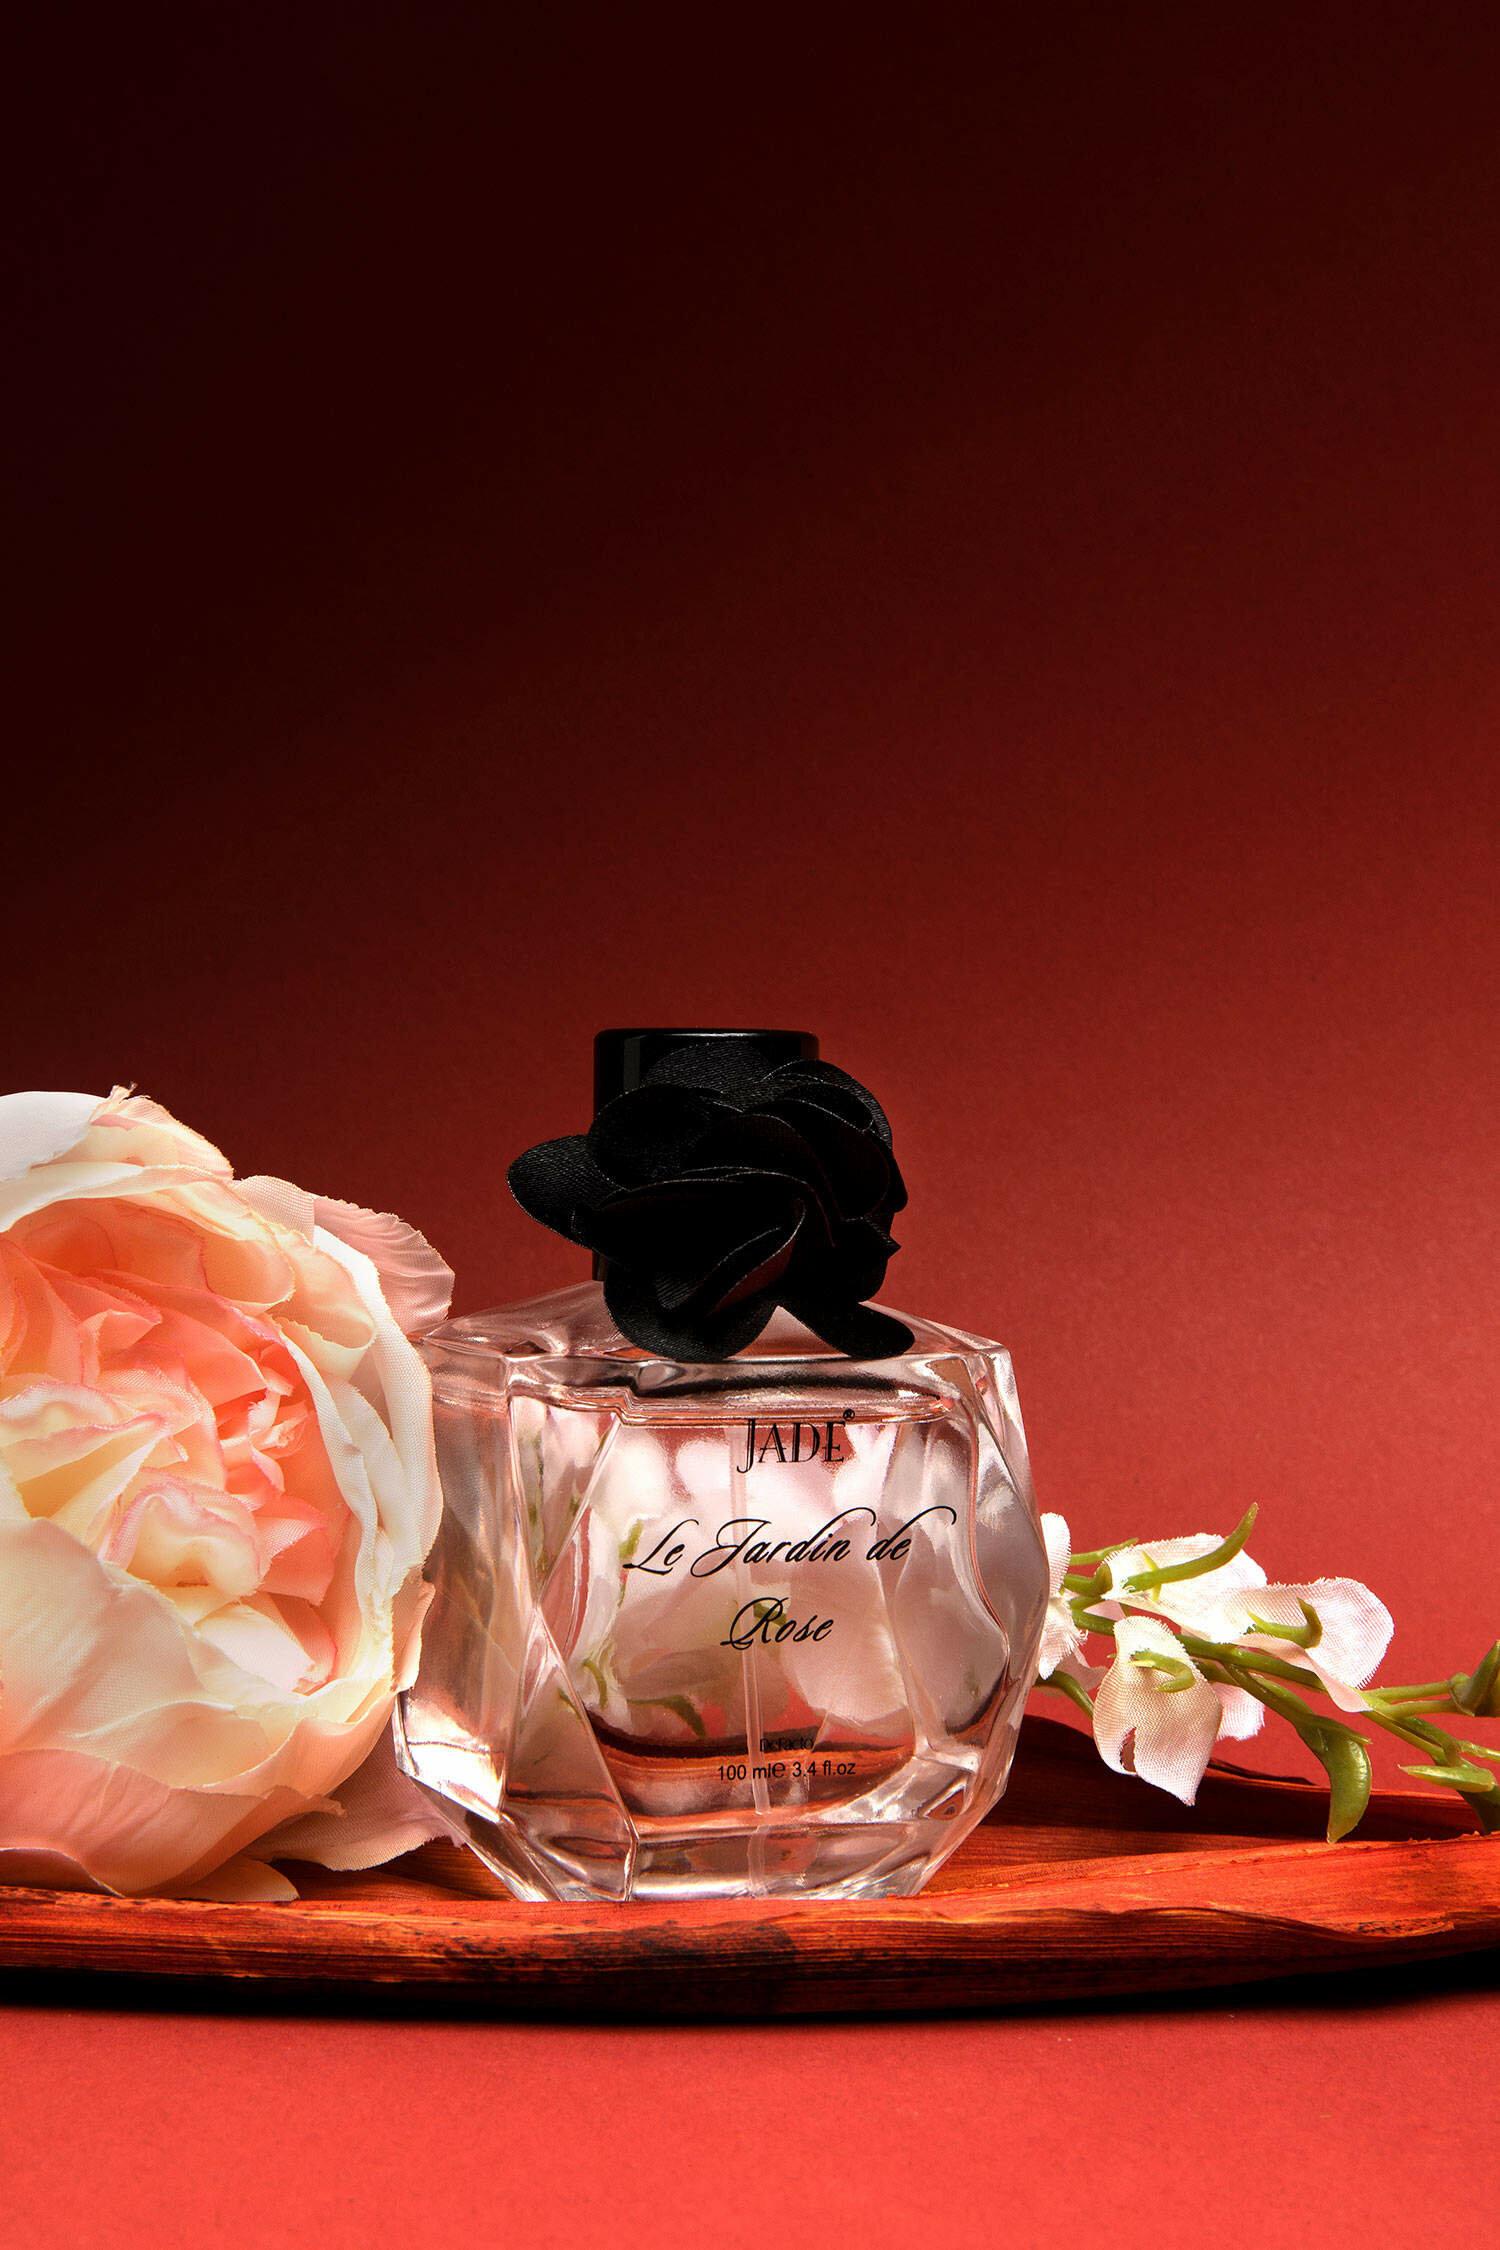 Jade Le Jardin De Rose 100 Ml Parfum dedans Salin De Jardin